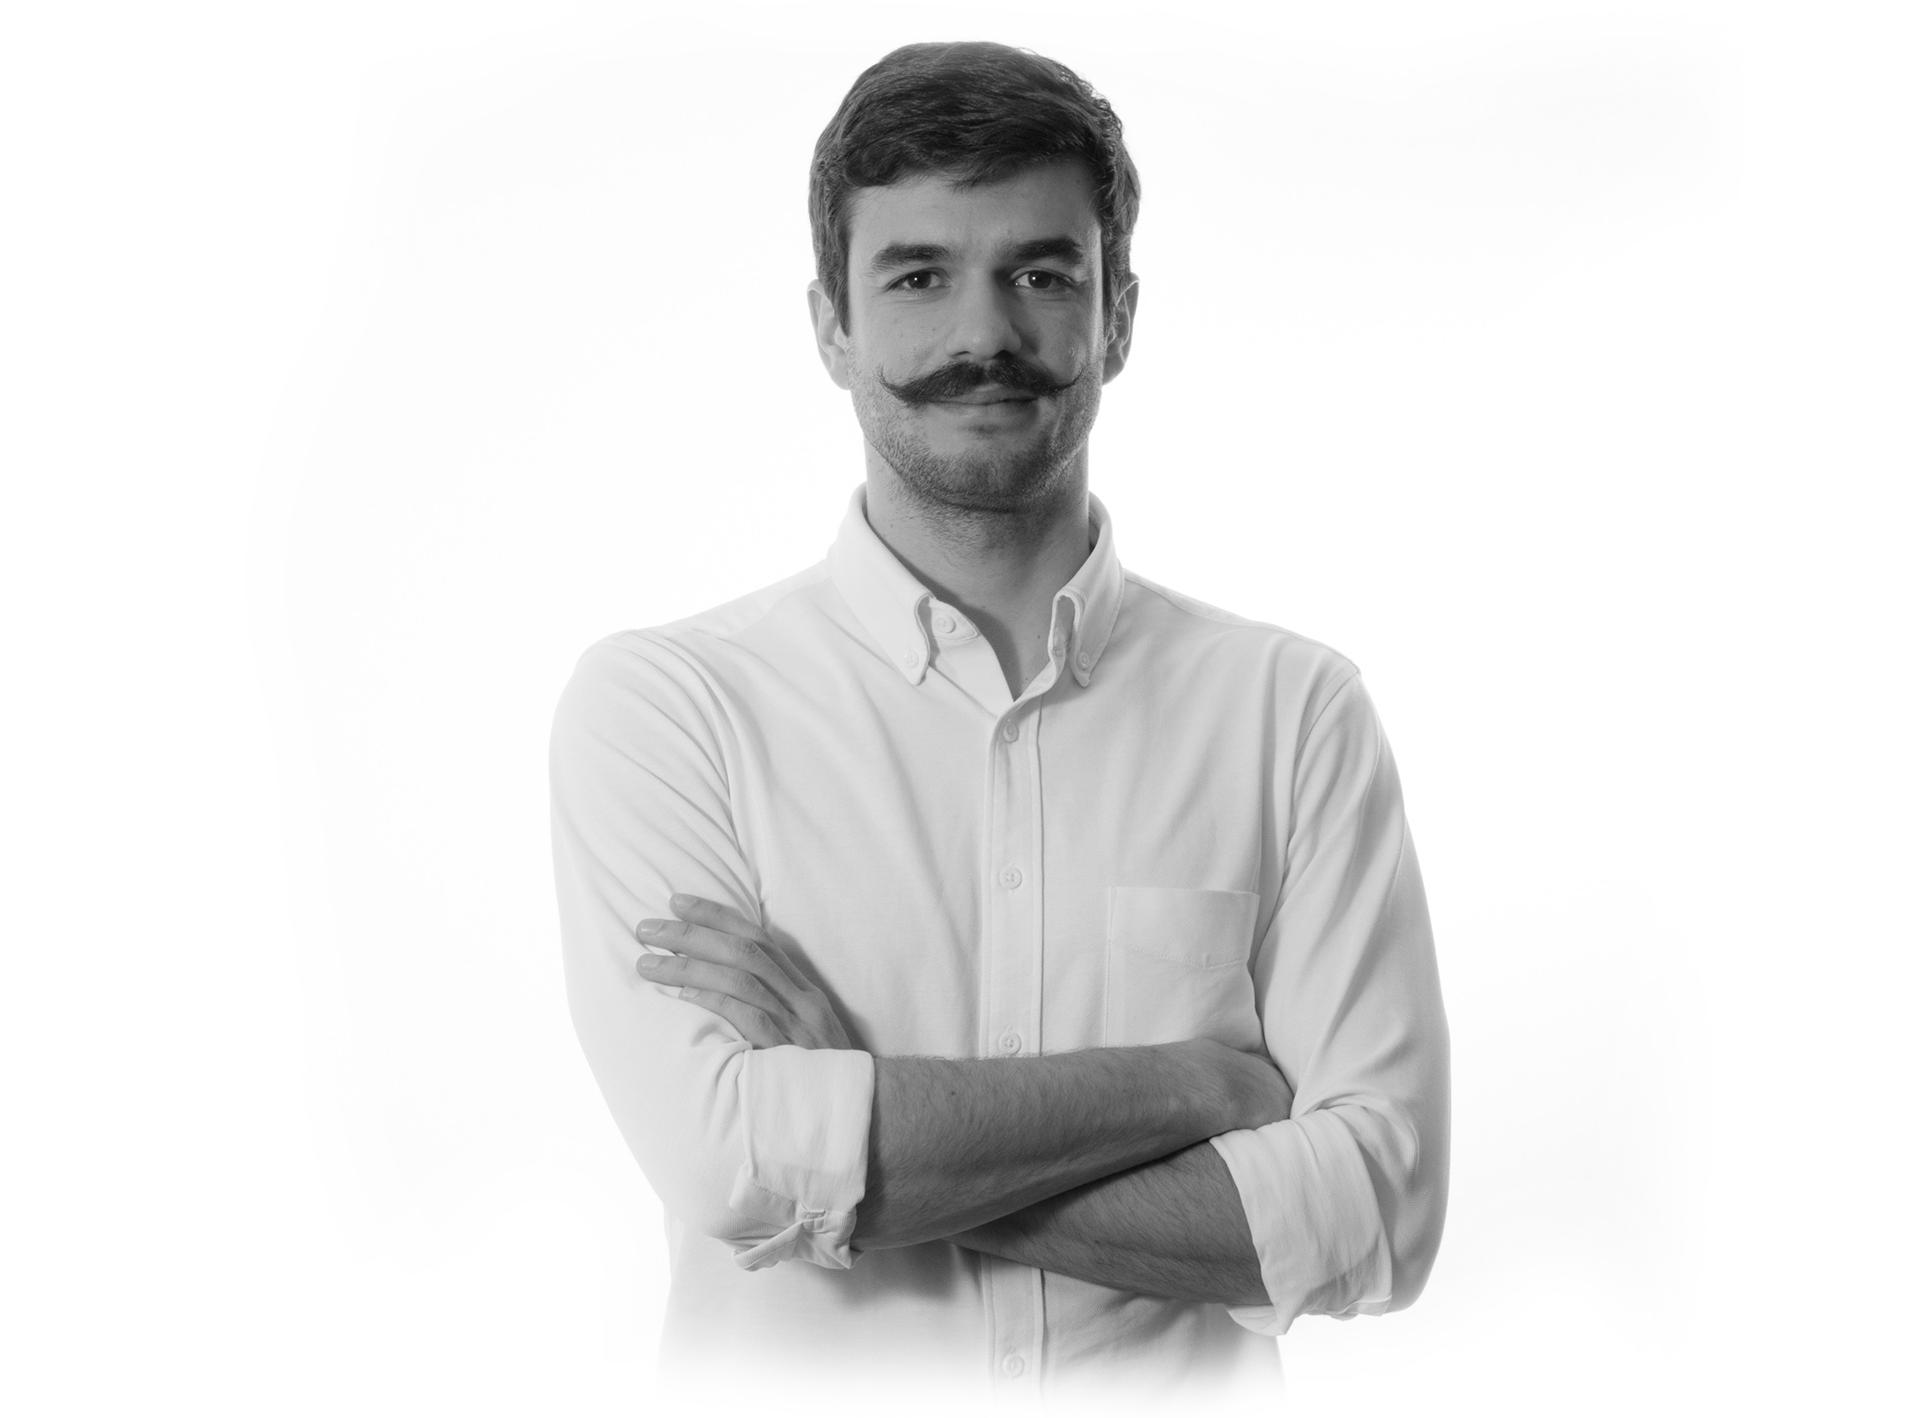 Agency Safari's   Filipe Macedo  has interviewed 50 agencies across Europe. He'll share the most original marketing tactics he discovered.